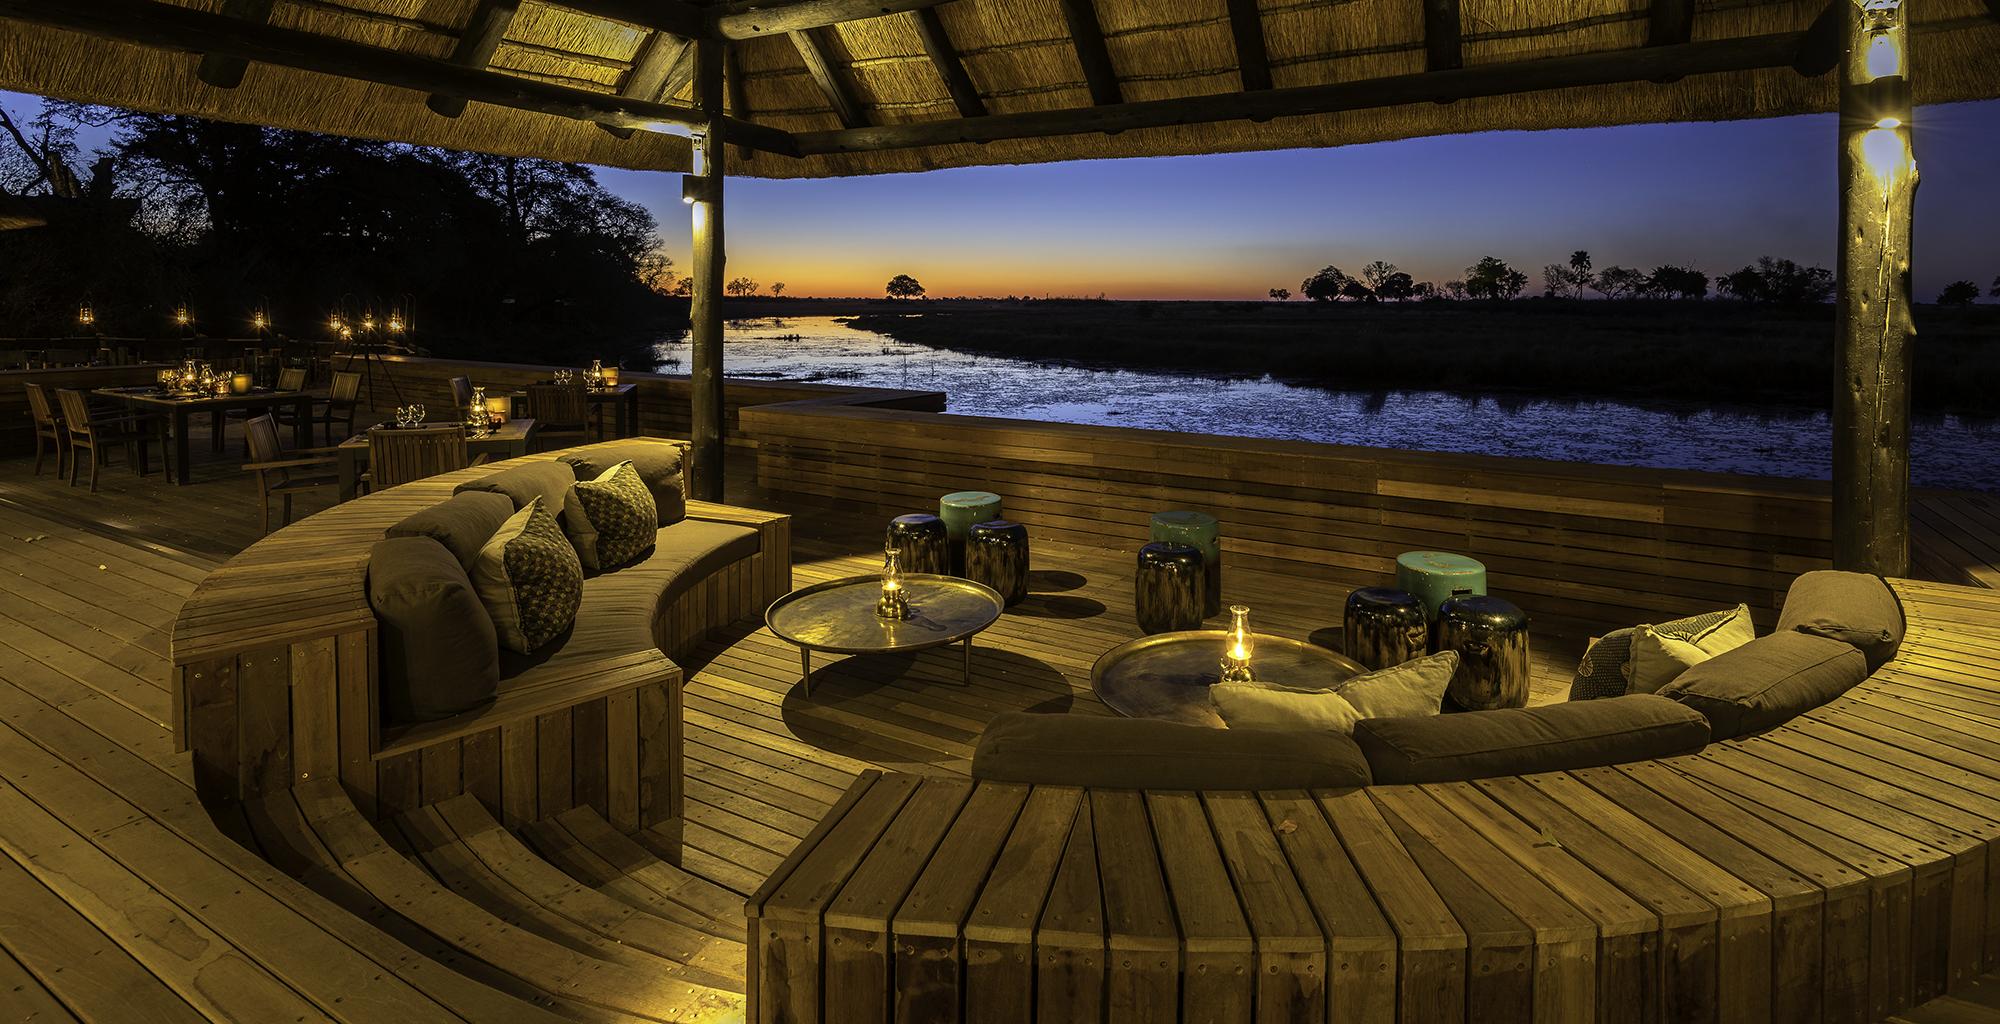 Botswana-Kings-Pool-Deck-Sunken-Lounge